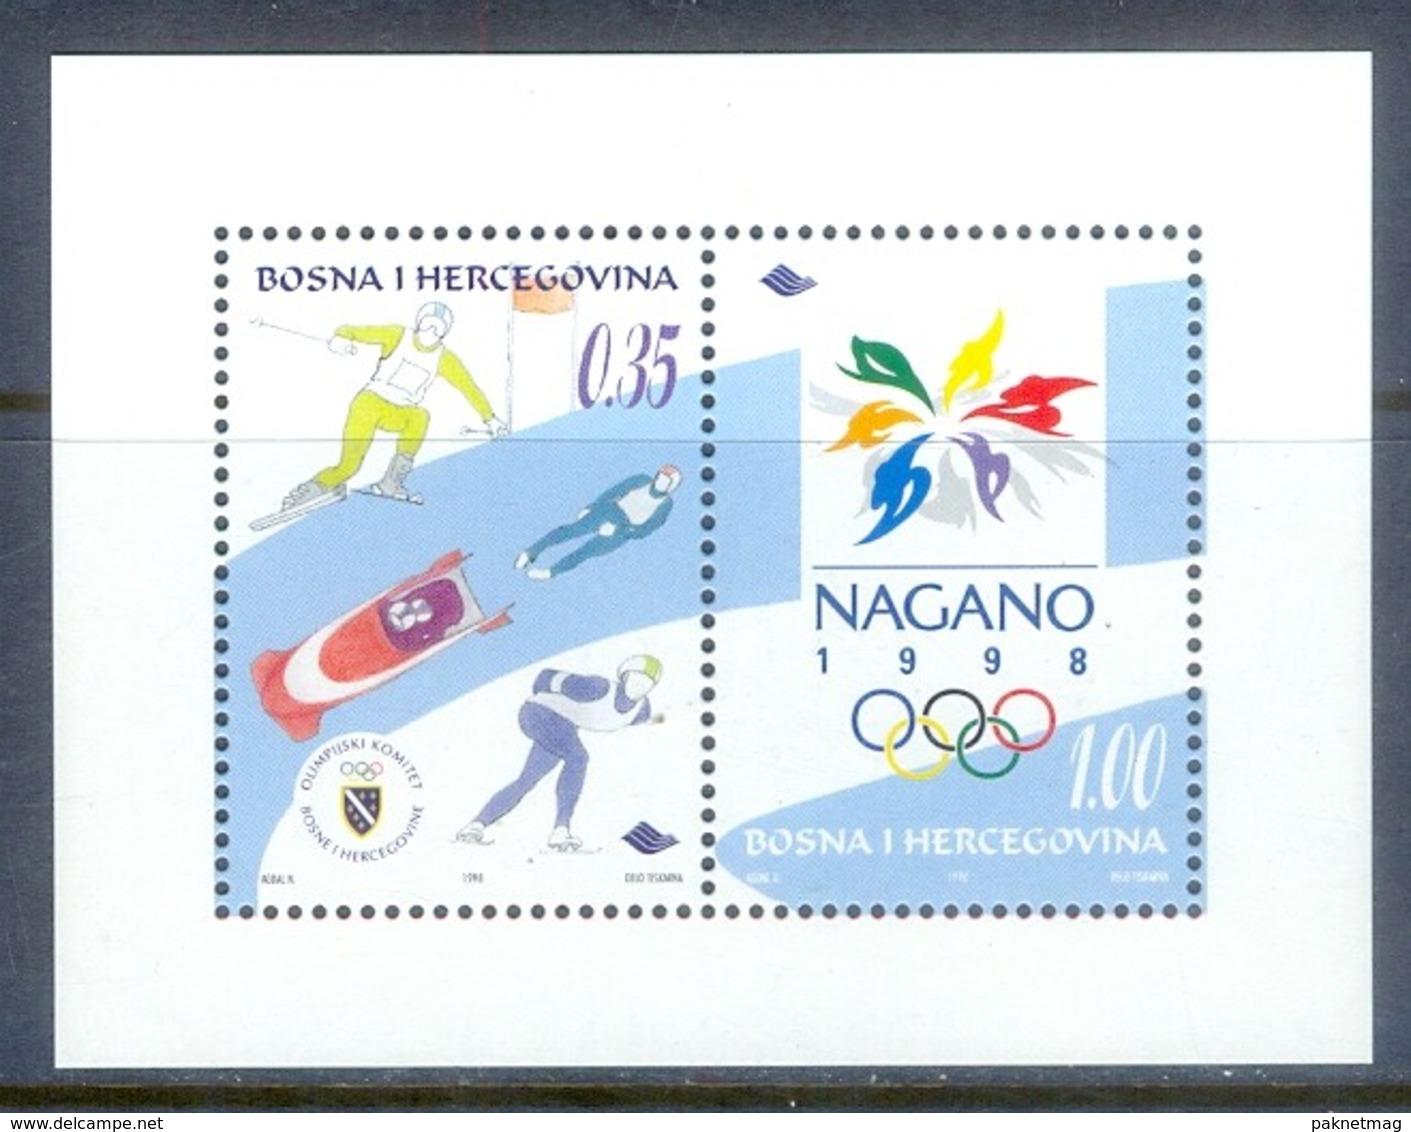 E171- Bosnia & Herzegovina 1998, Sport Olympic Games. Nagano Skiing Skating Bob Skeleton. - Other